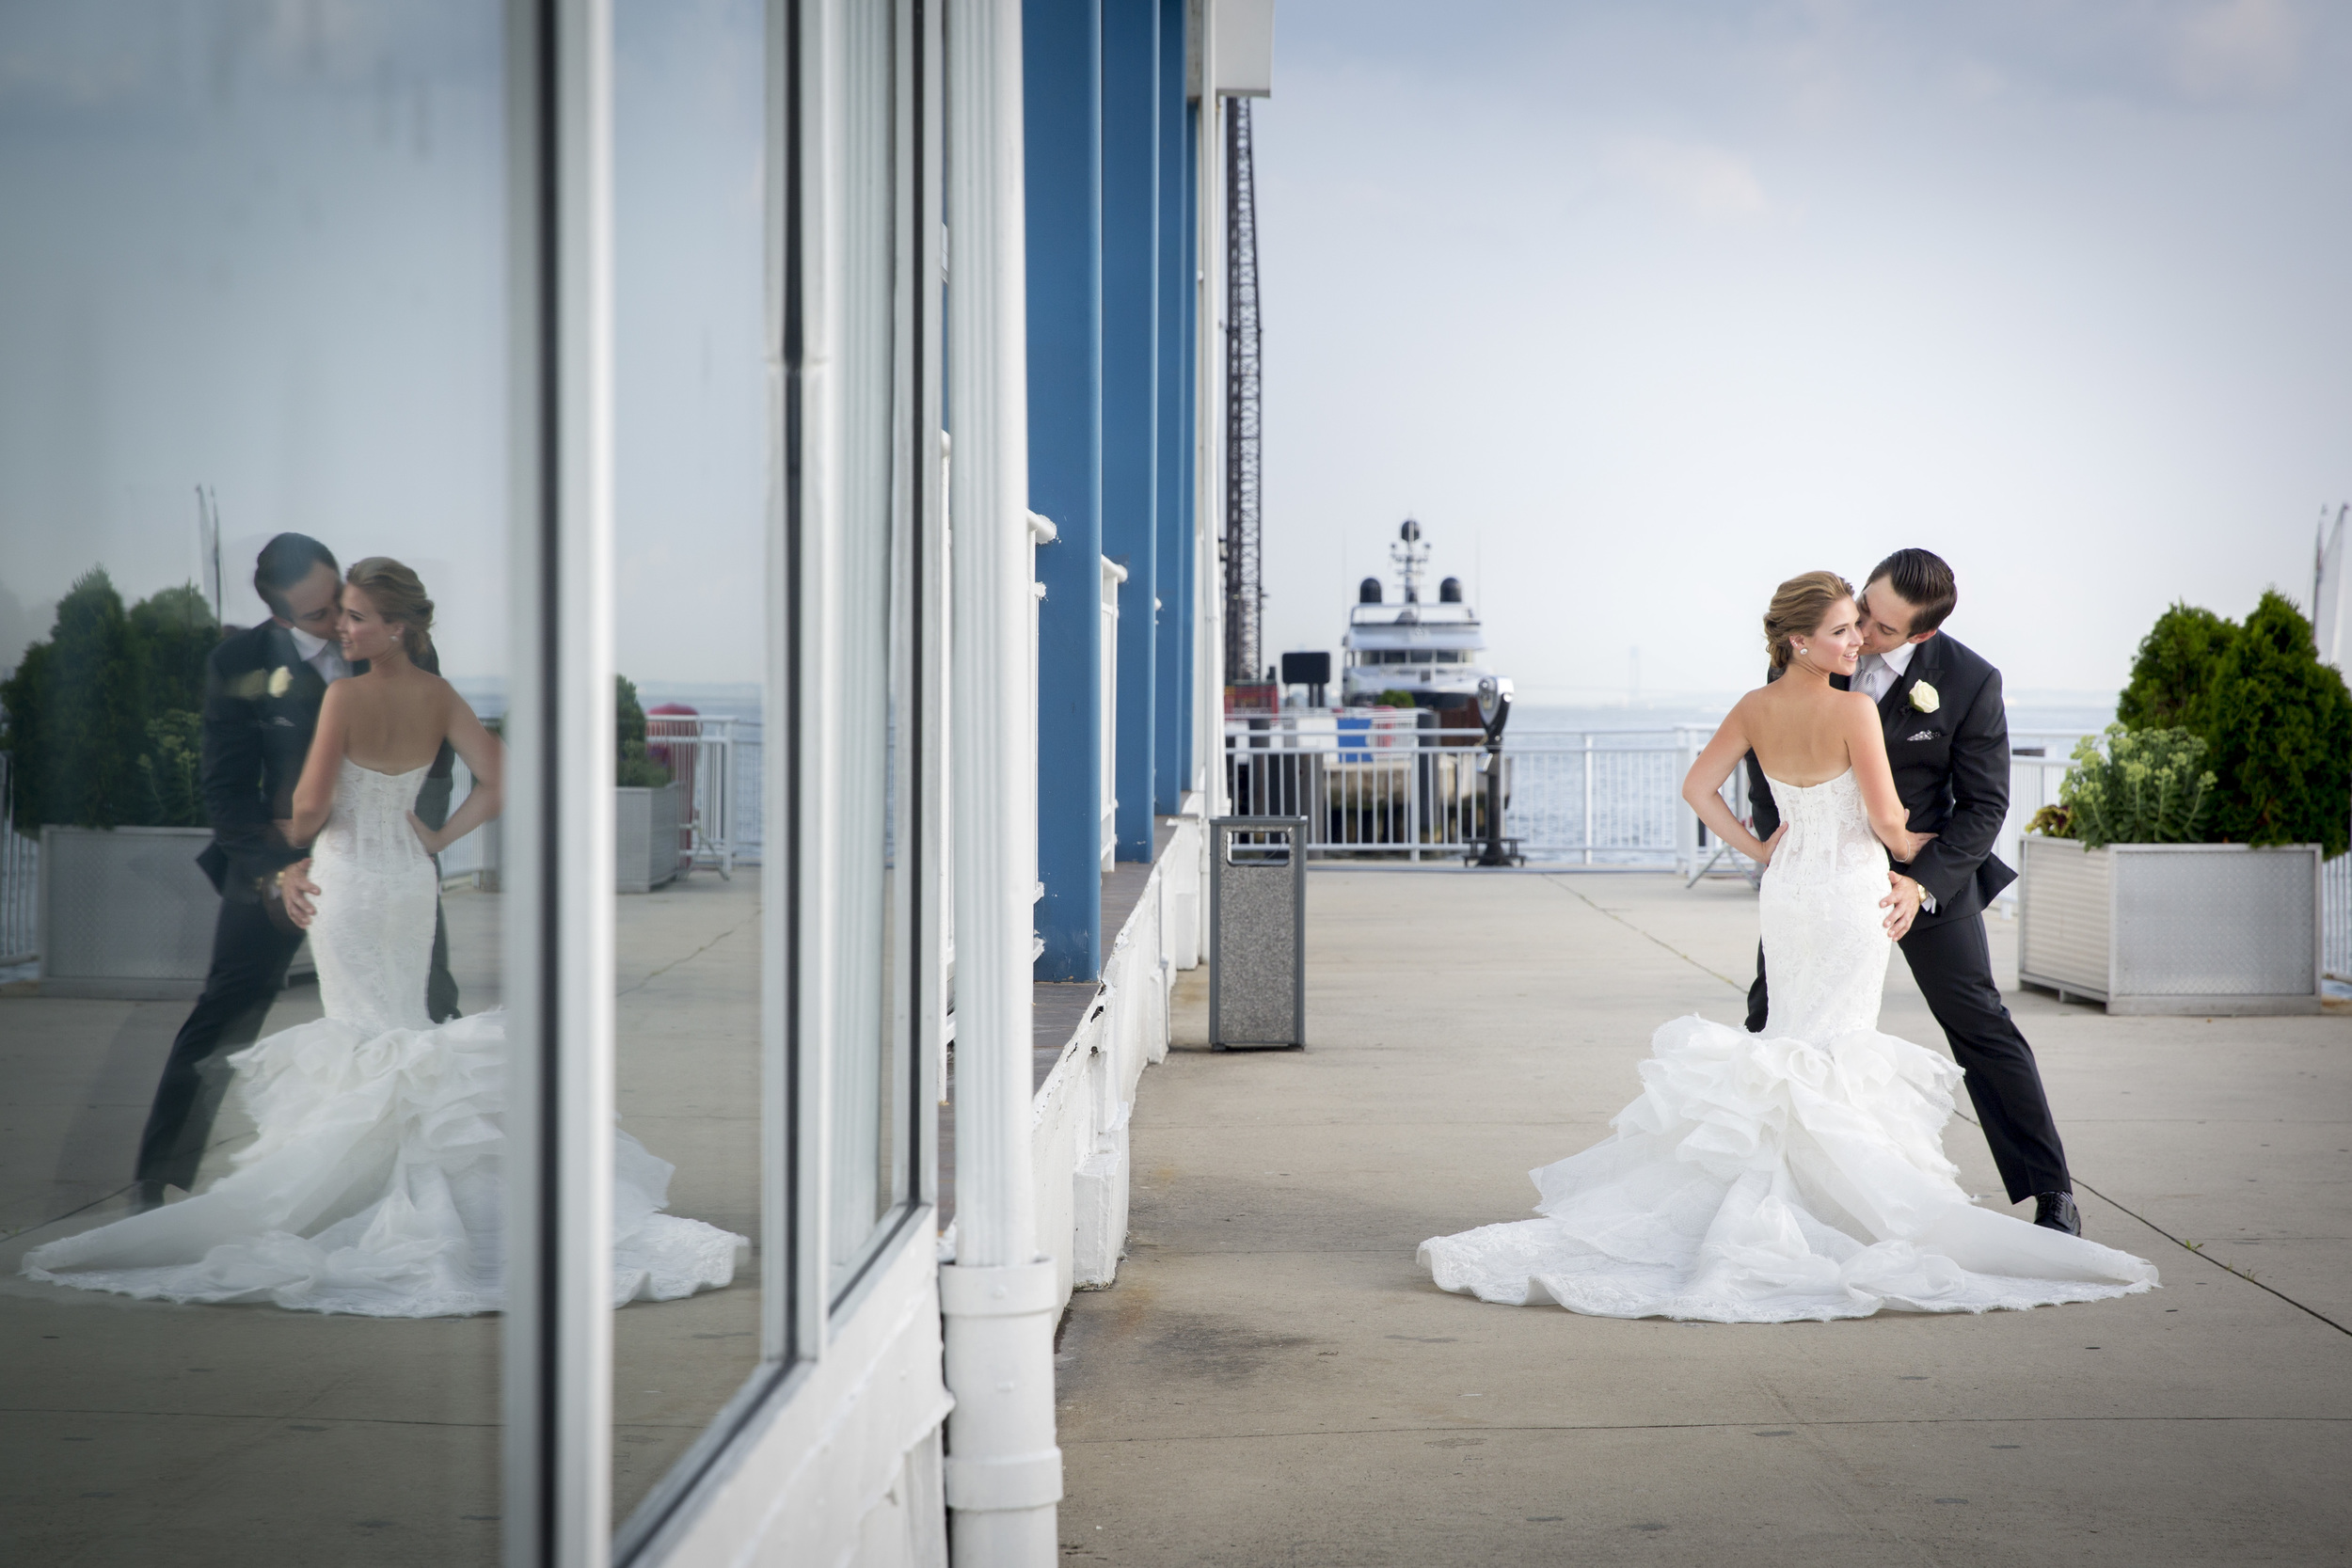 Ceci_New_York_Style_Luxury_Custom_Summer_Wedding_CeciBride_Letterpress_NewYork_Foil_Lighthouse_Chelsea_Piers_41.jpg